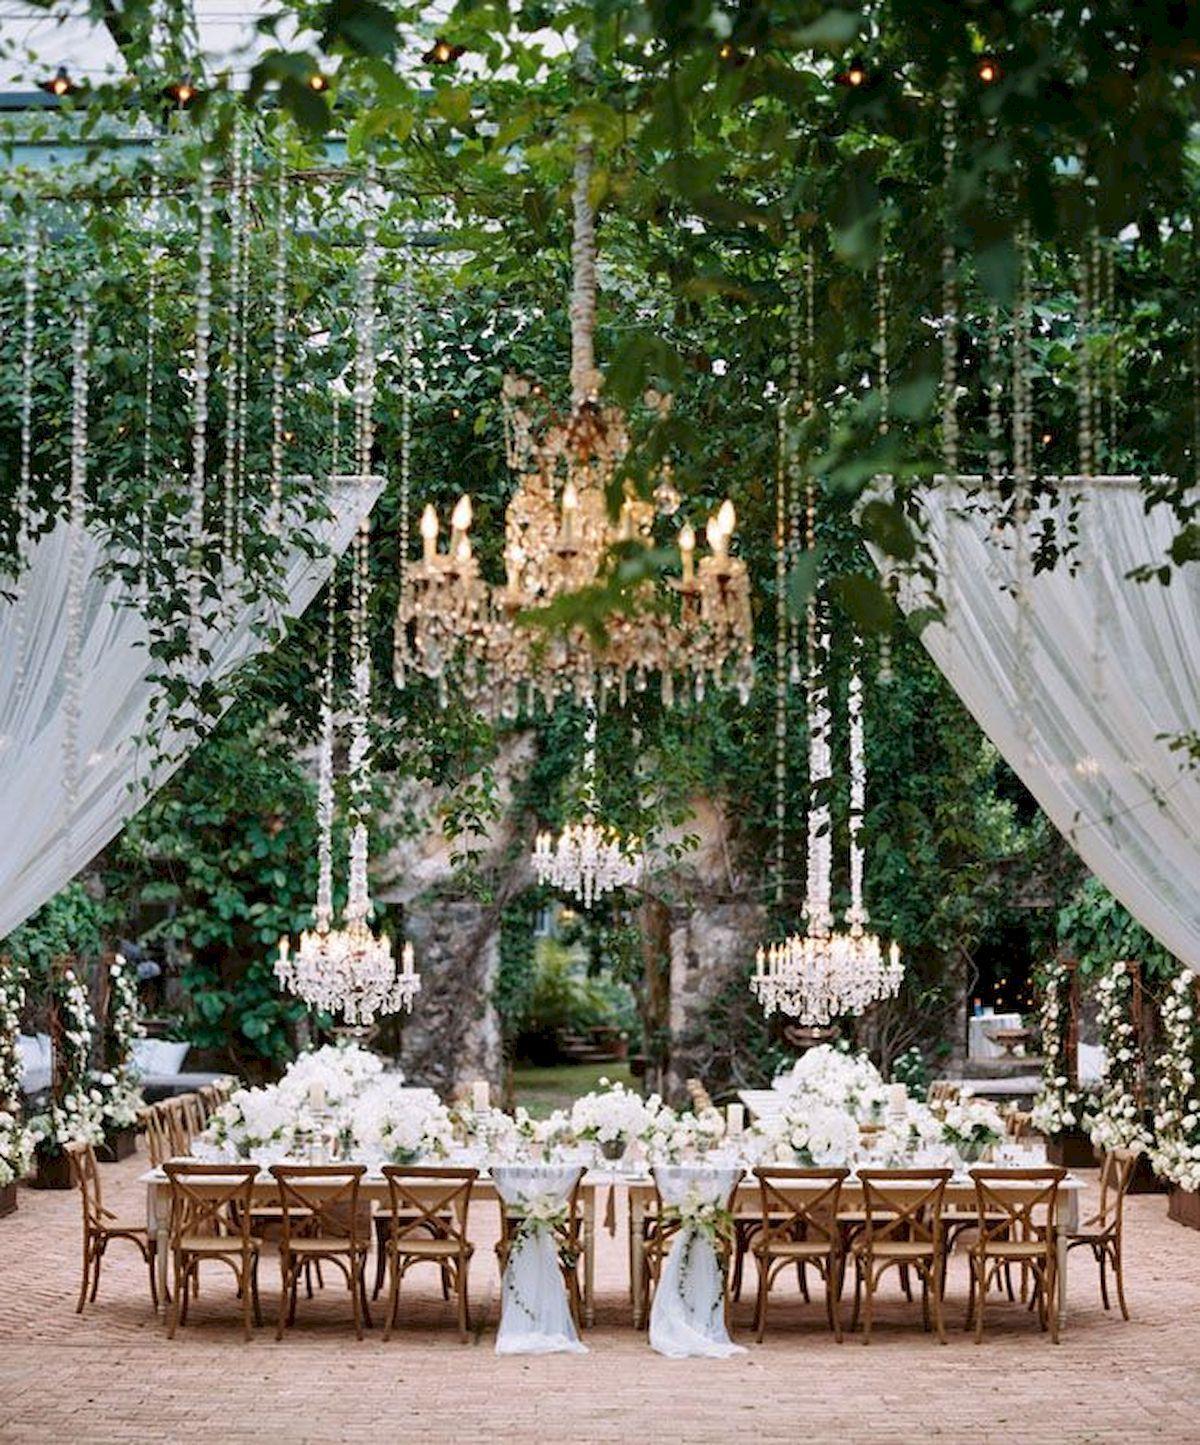 Indoor garden wedding reception decorations elegant luxury decor chandelier also create  outdoor ideas you can be proud of party rh pinterest